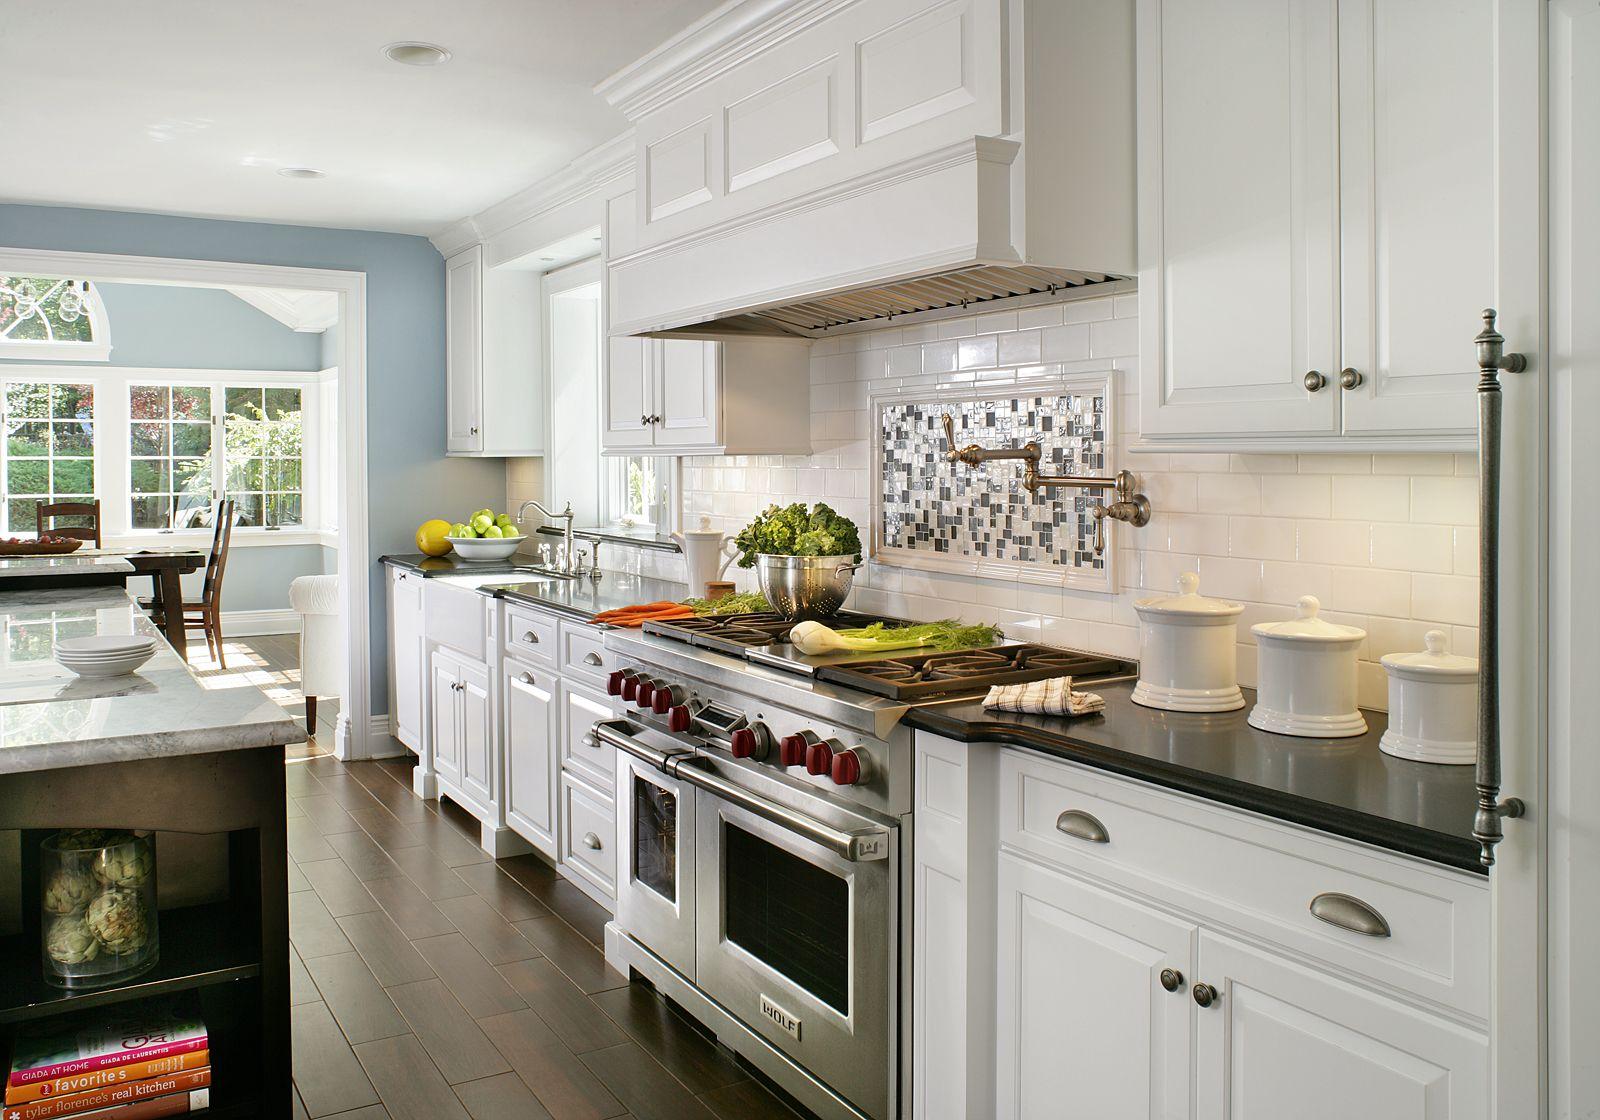 Kitchens by Rose - S series range hood by Stanisci Design | Favorite ...